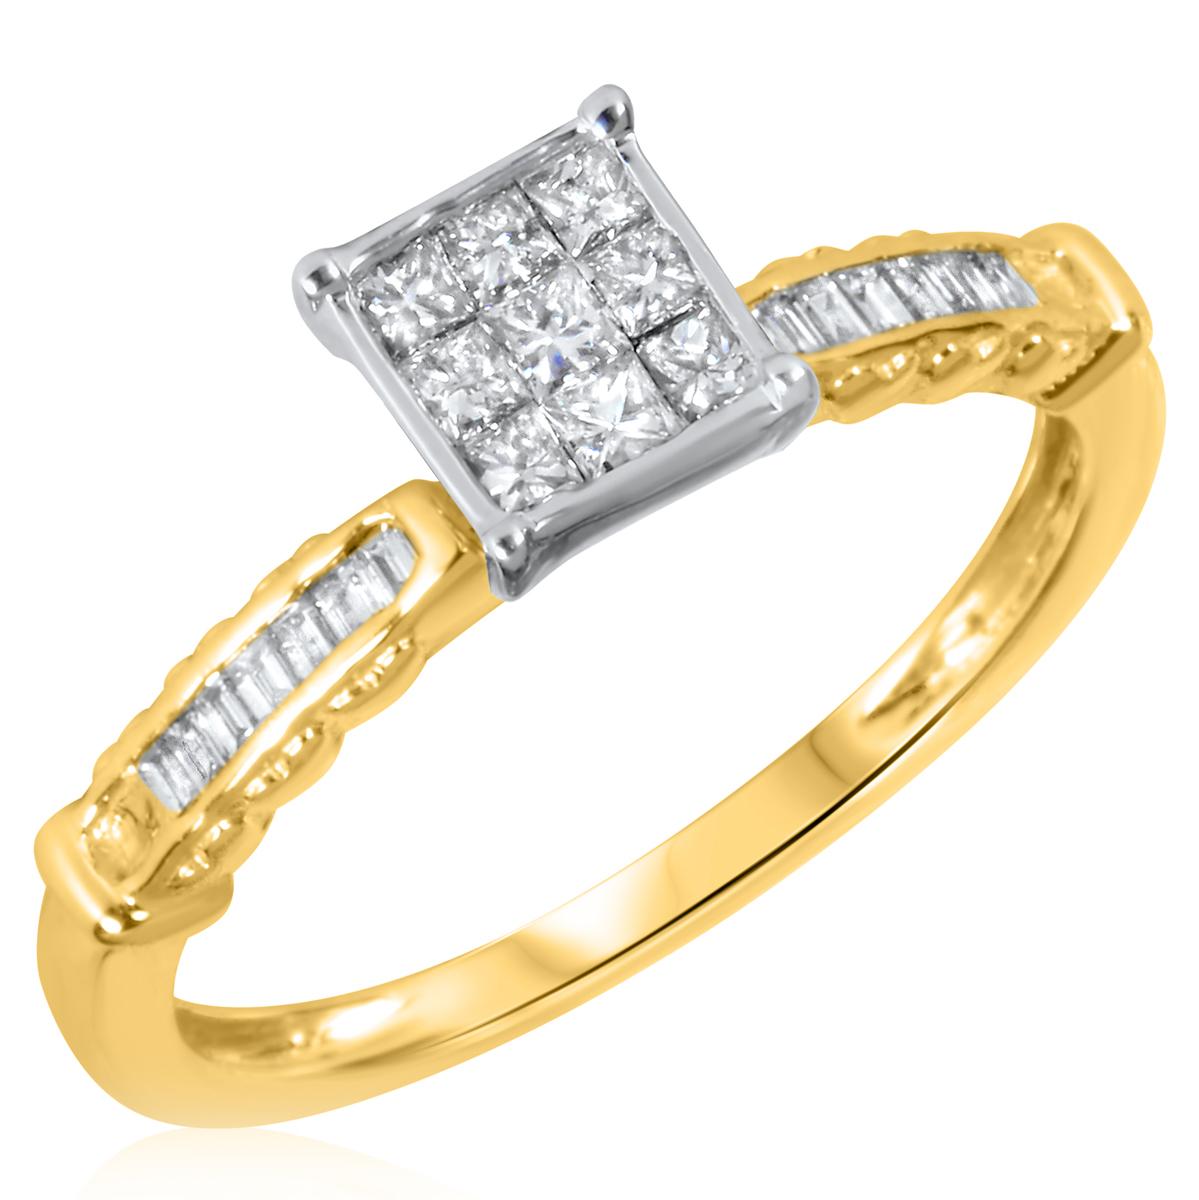 1/2 Carat T.W. Princess, Baguette Cut Diamond Women's Engagement Ring 14K Yellow